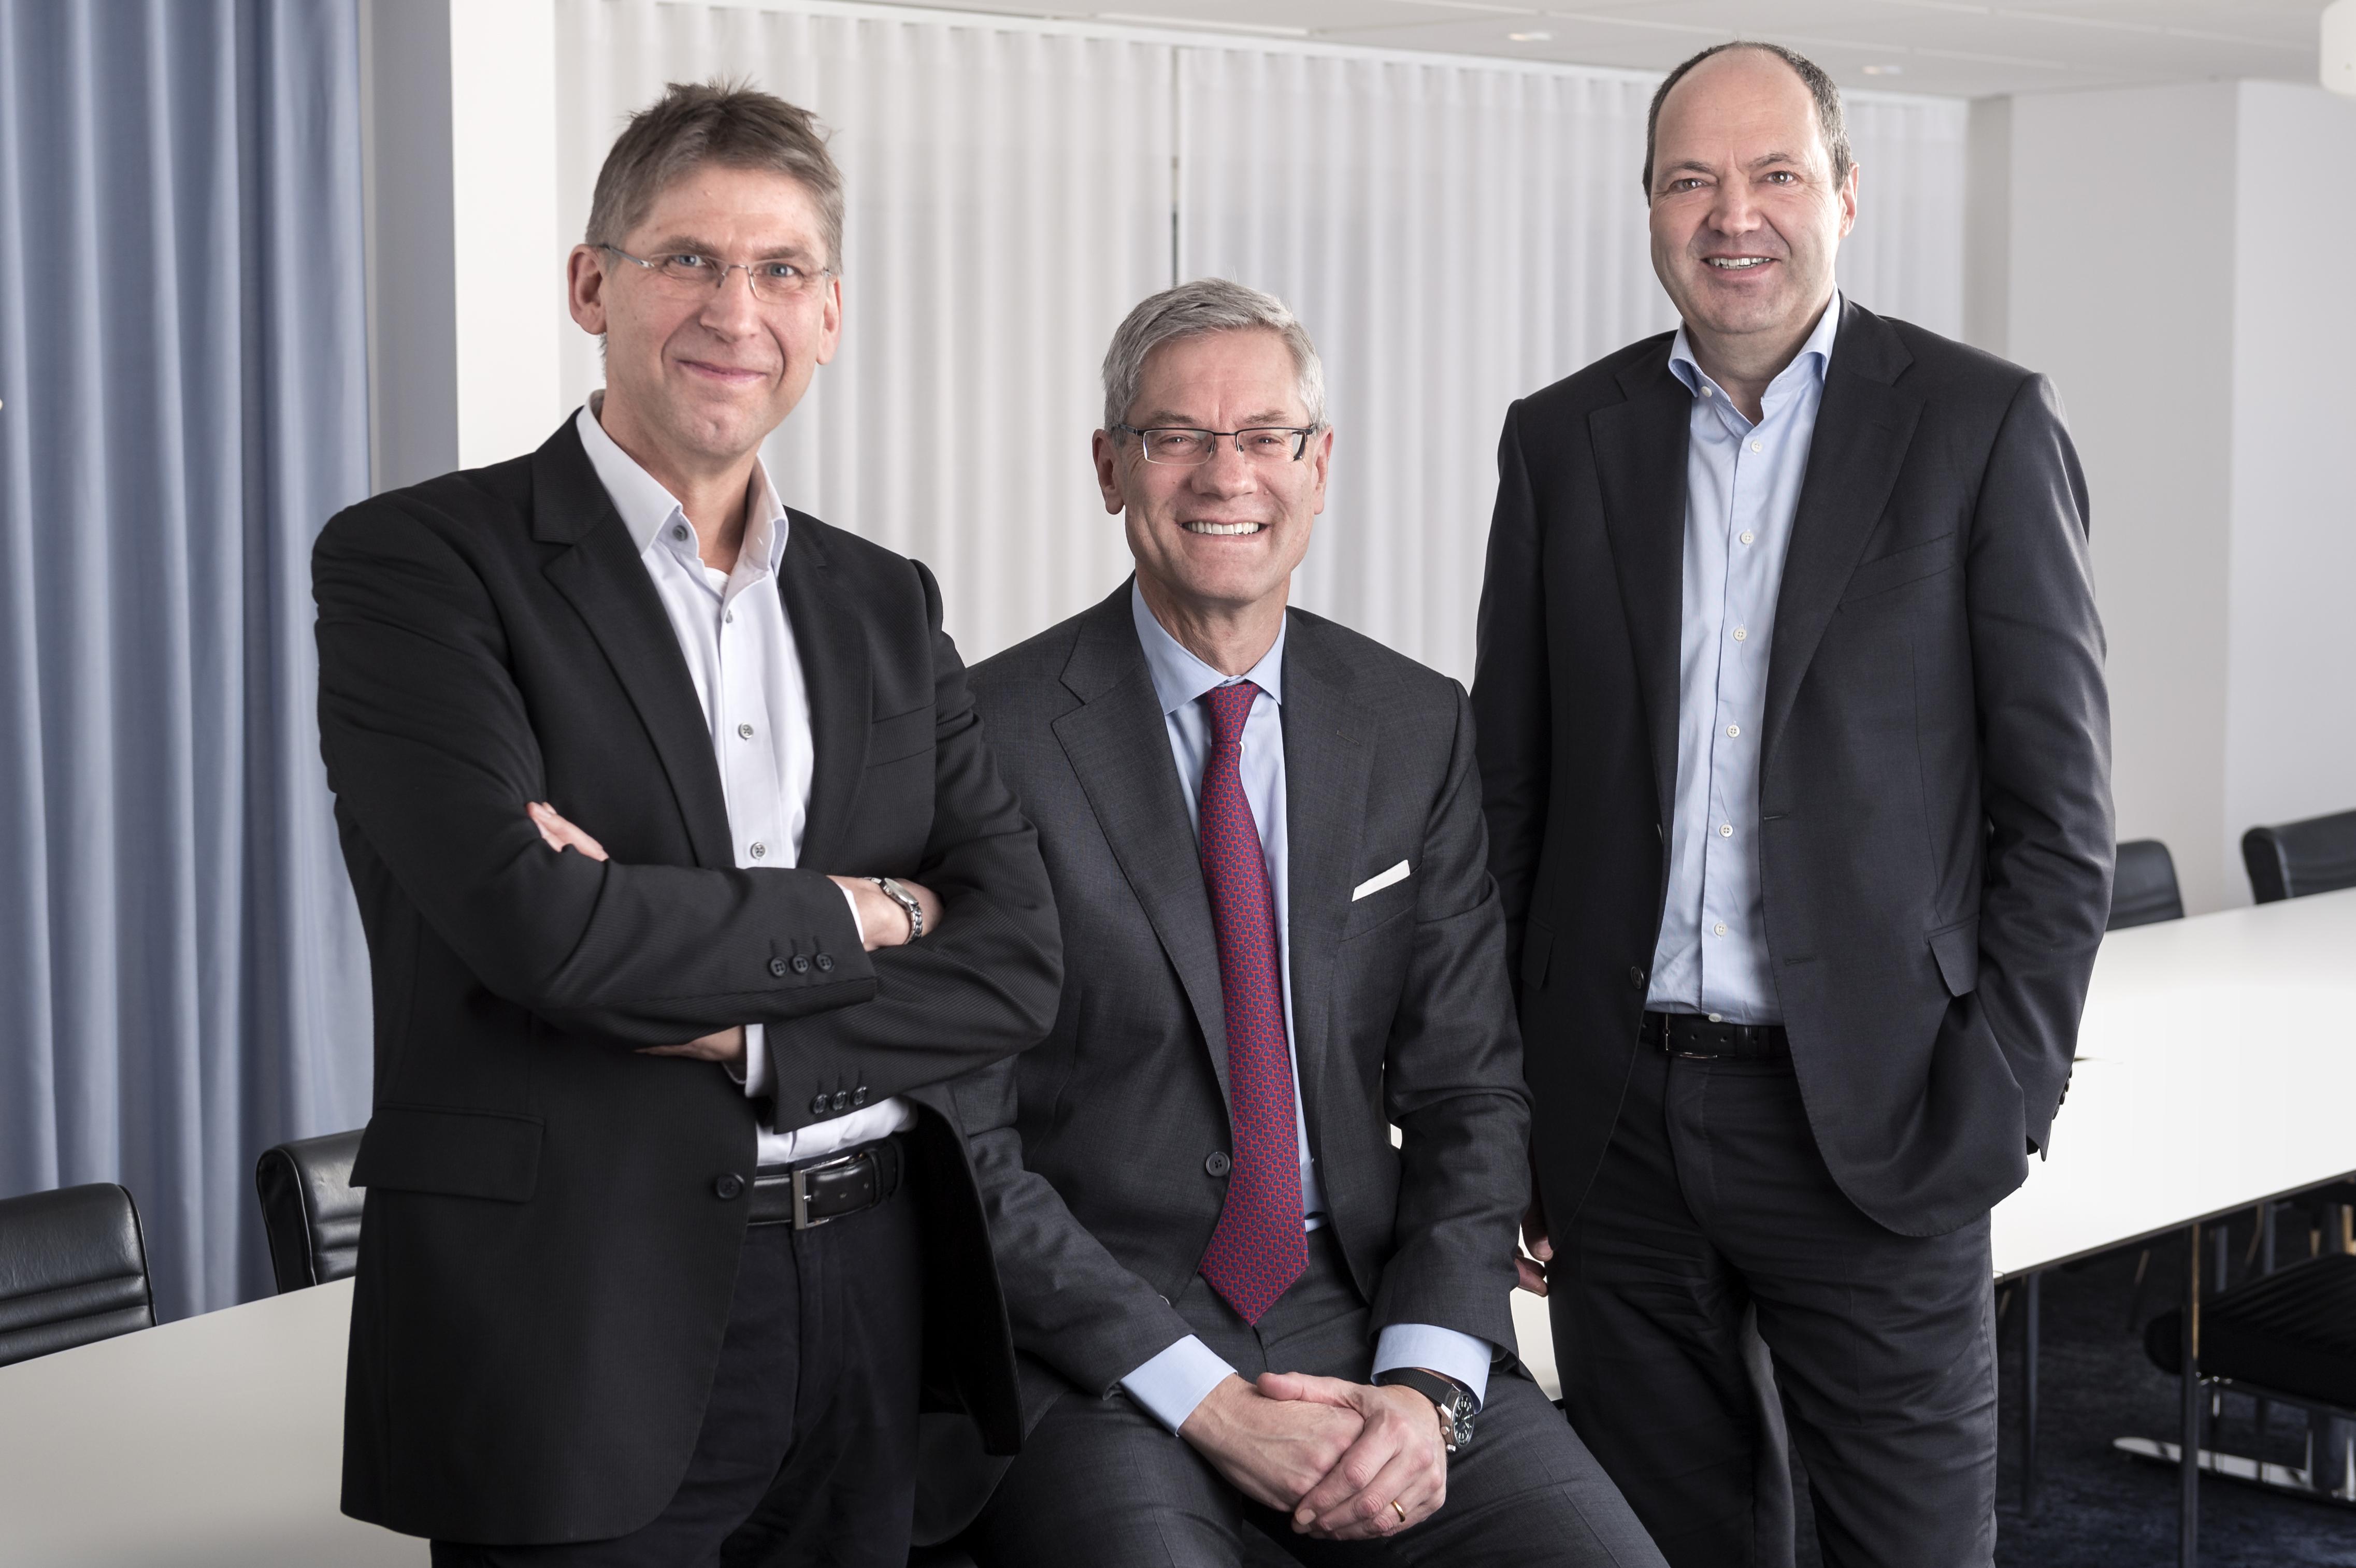 SSAB, LKAB and Vattenfall